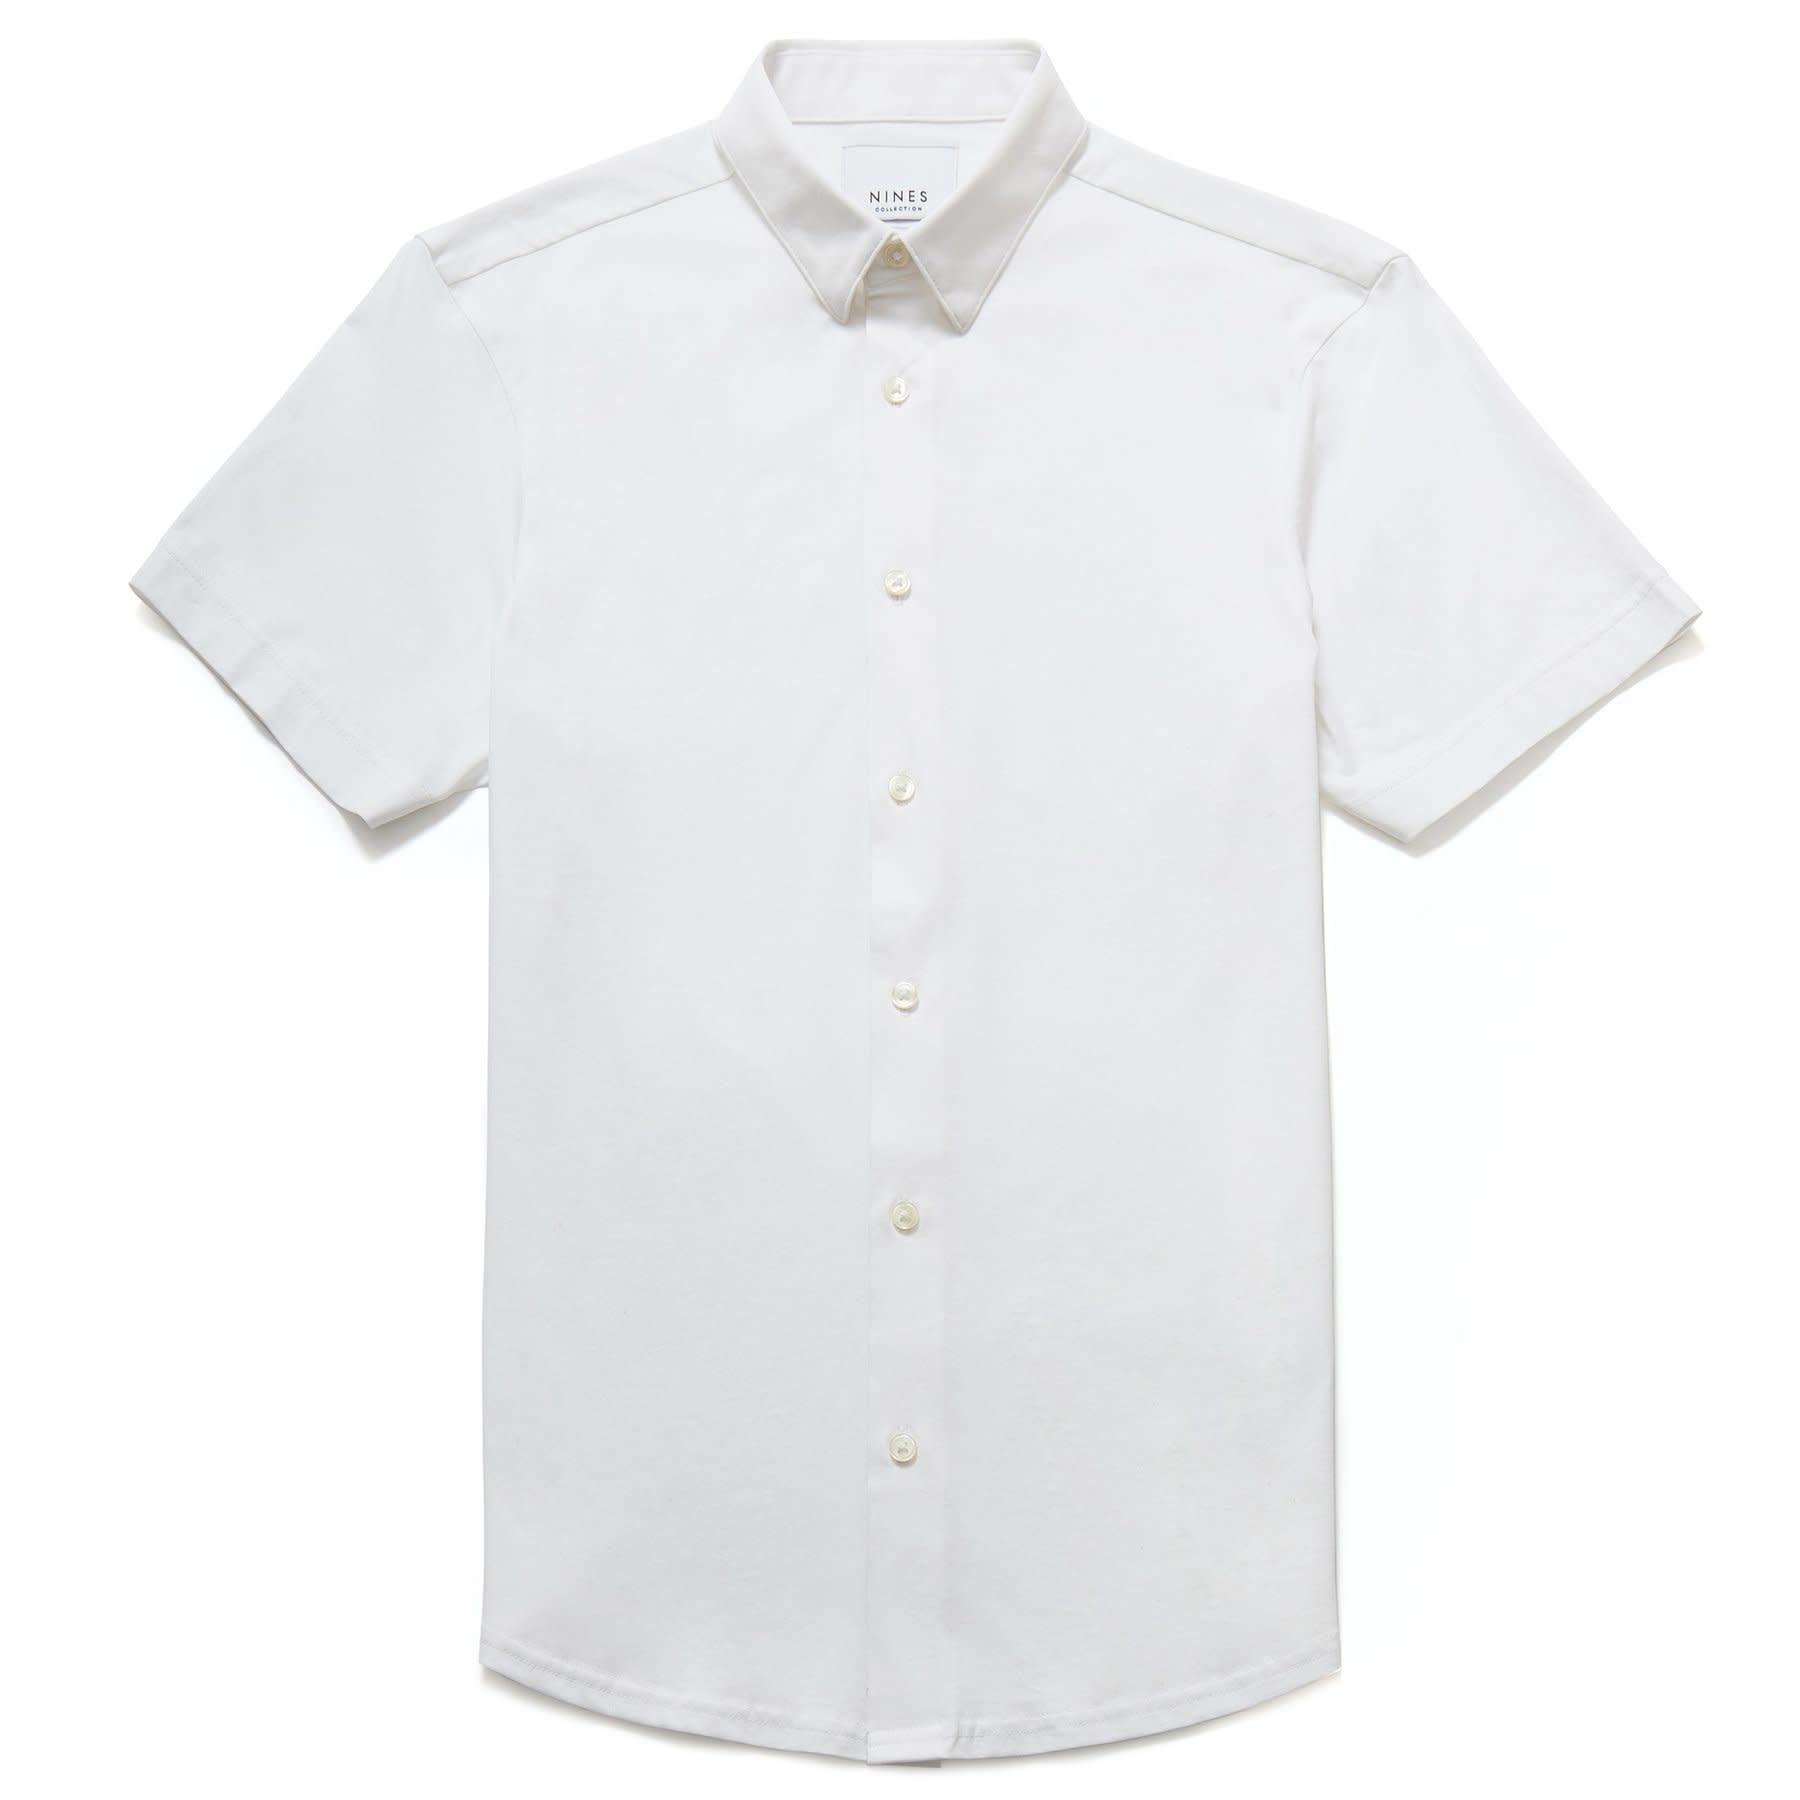 Nines Nines NC Potenza 1H12669 white